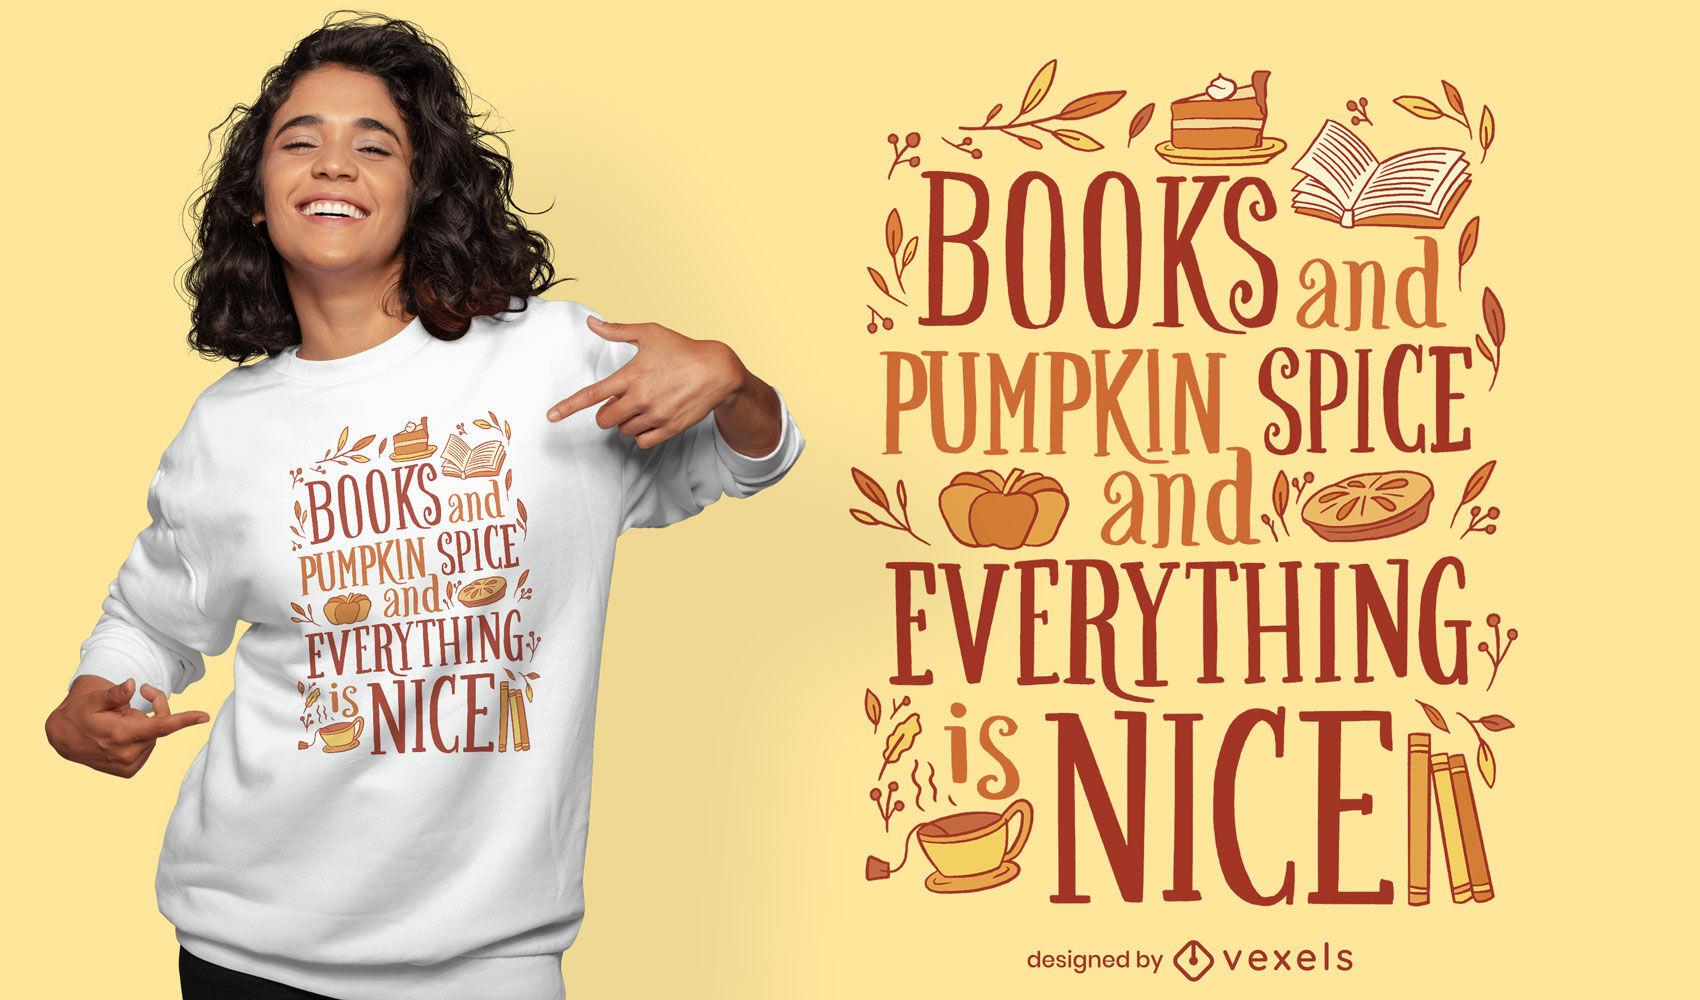 Cool pumpkin quote t-shirt design